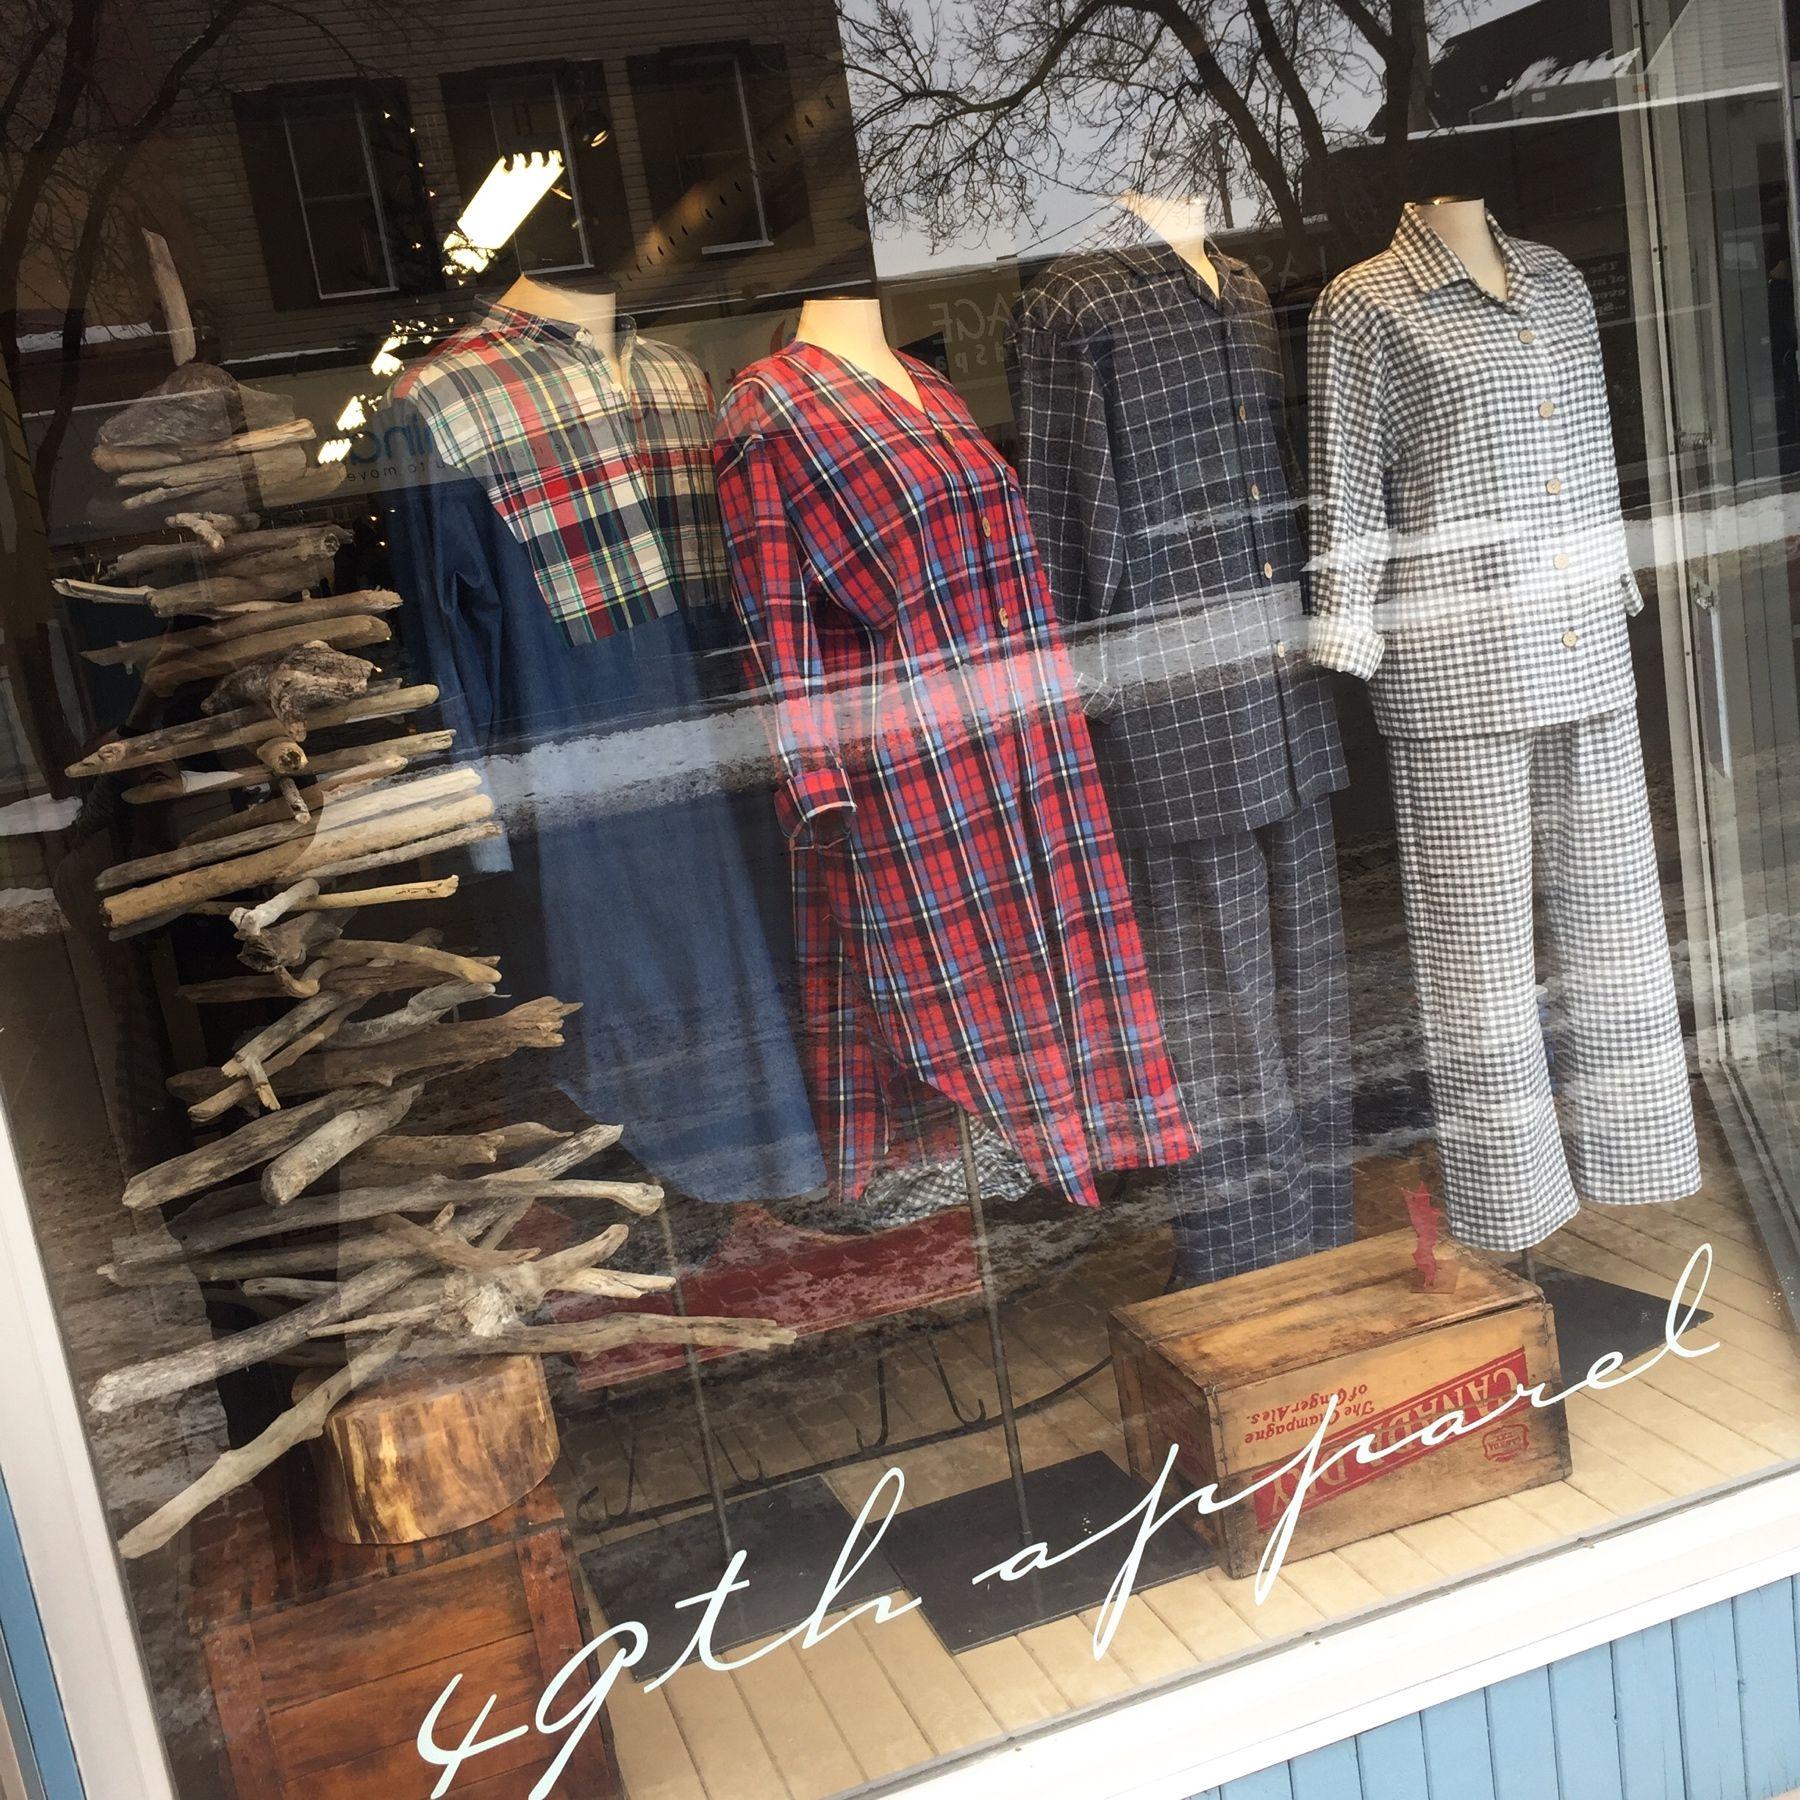 49th Apparel Christmas Sleepwear Window Display